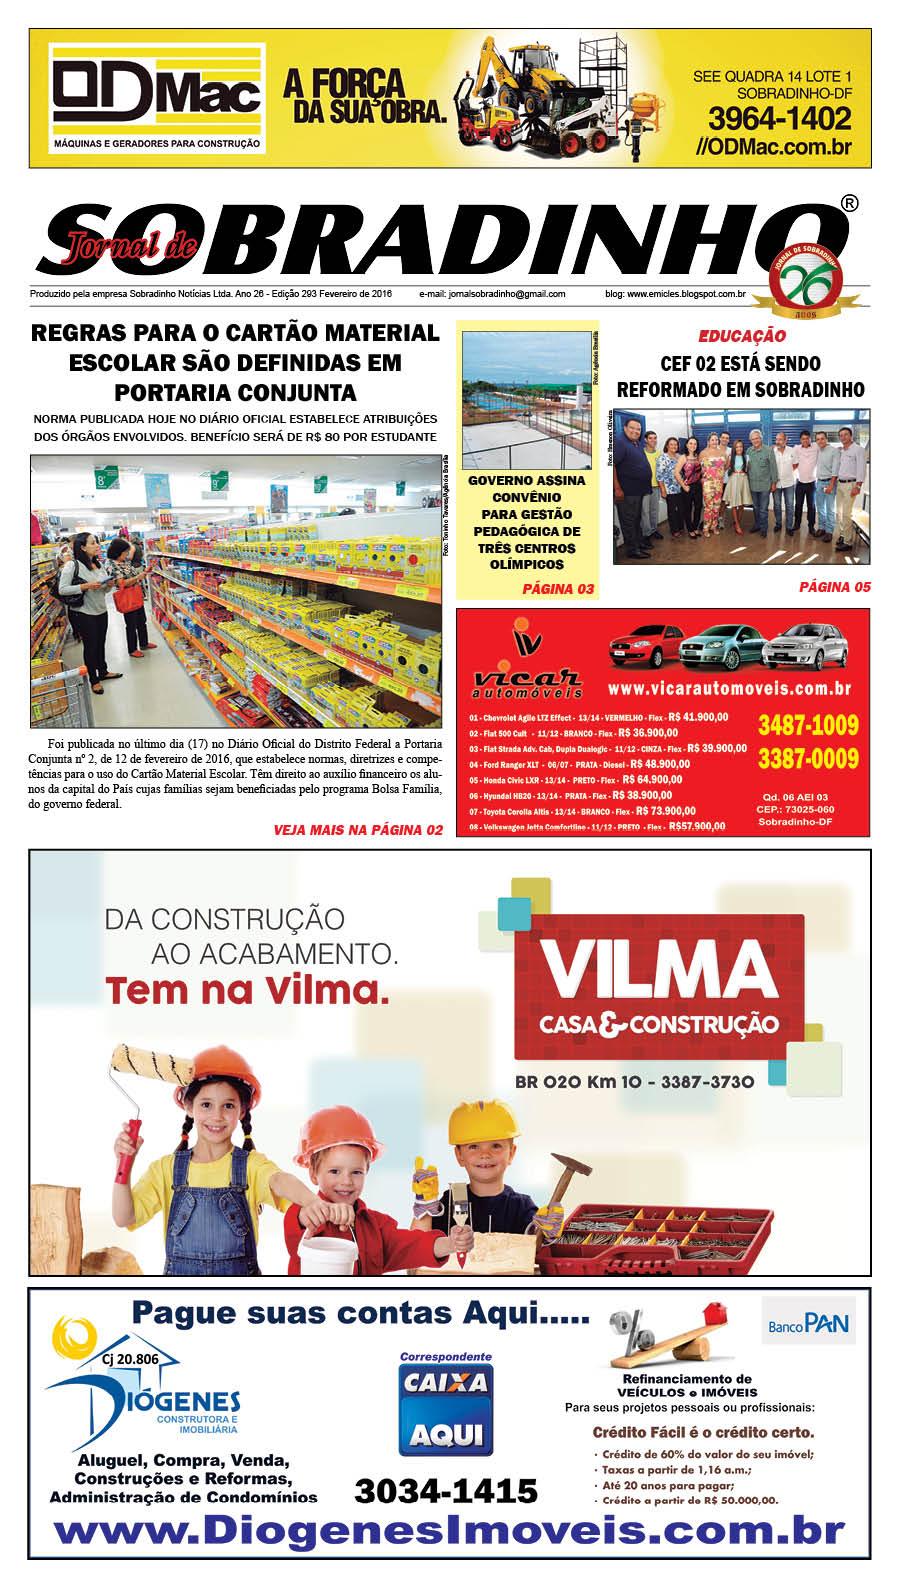 JORNAL VIRTUAL - FEVEREIRO  de 2016 - ED 293 -